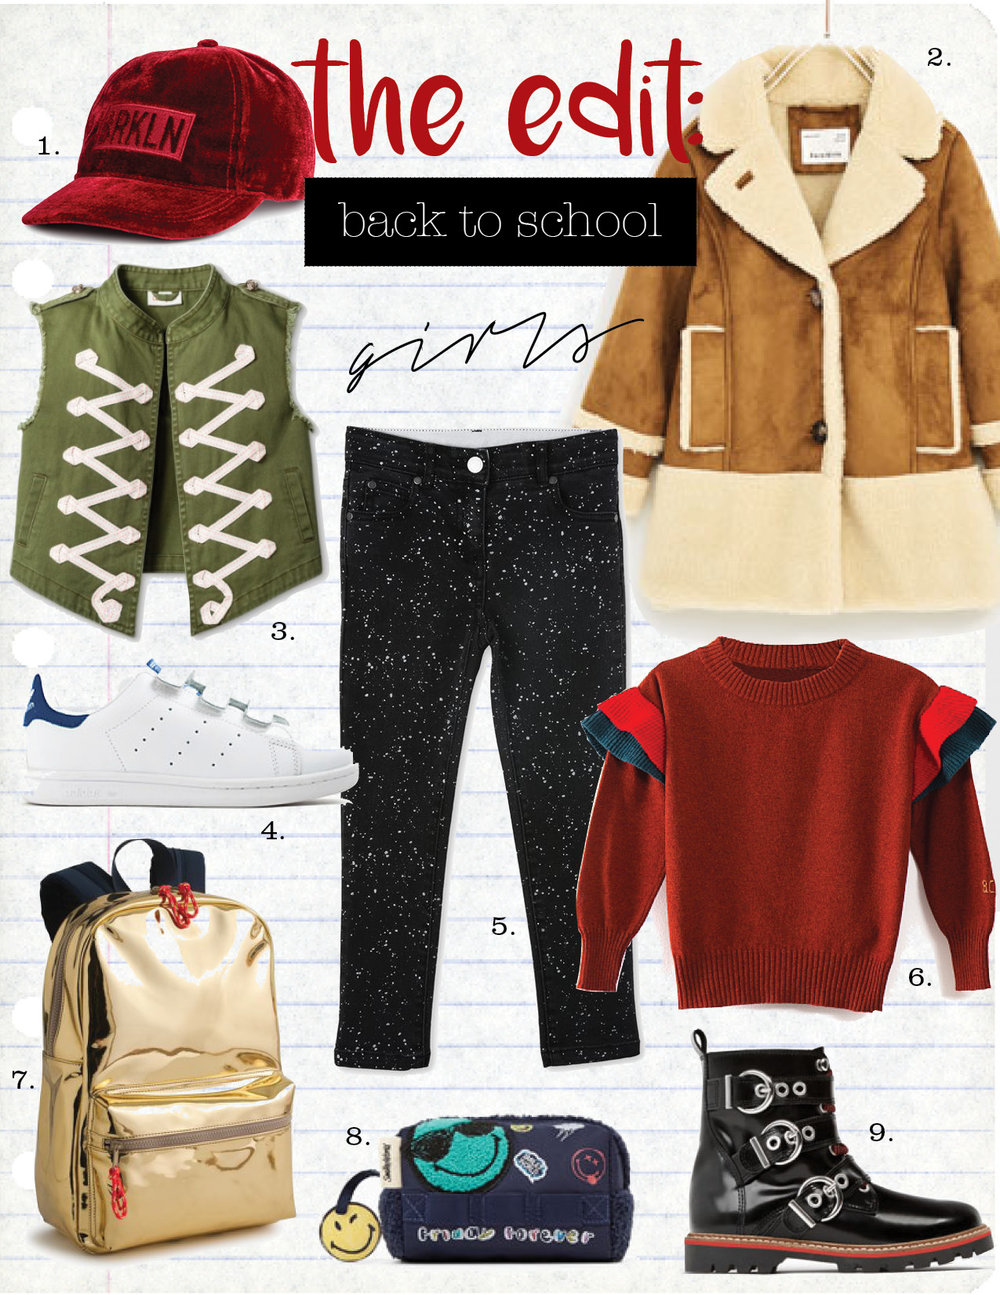 1. h&m cap with APPLIQUÉ at front, $9,  hm.com   2. zara shearling coat, $59,  zara.com  3. cat & jack sleeveless vest, $19,  target.com  4. adidas stan smith sneakers, $65,  jcrew.com  5. stella mccartney nina splatter print jeans, $104,  stellamccartney.com  6. bobo choses ruffles knitted jumper, $105,  yoyanyc.com  7. jcrew kids' iridescent backpack, $68,  jcrew.com  8. zara smiley case, $15,  zara.com  9. zara leather biker boots with buckles, $65,  zara.com